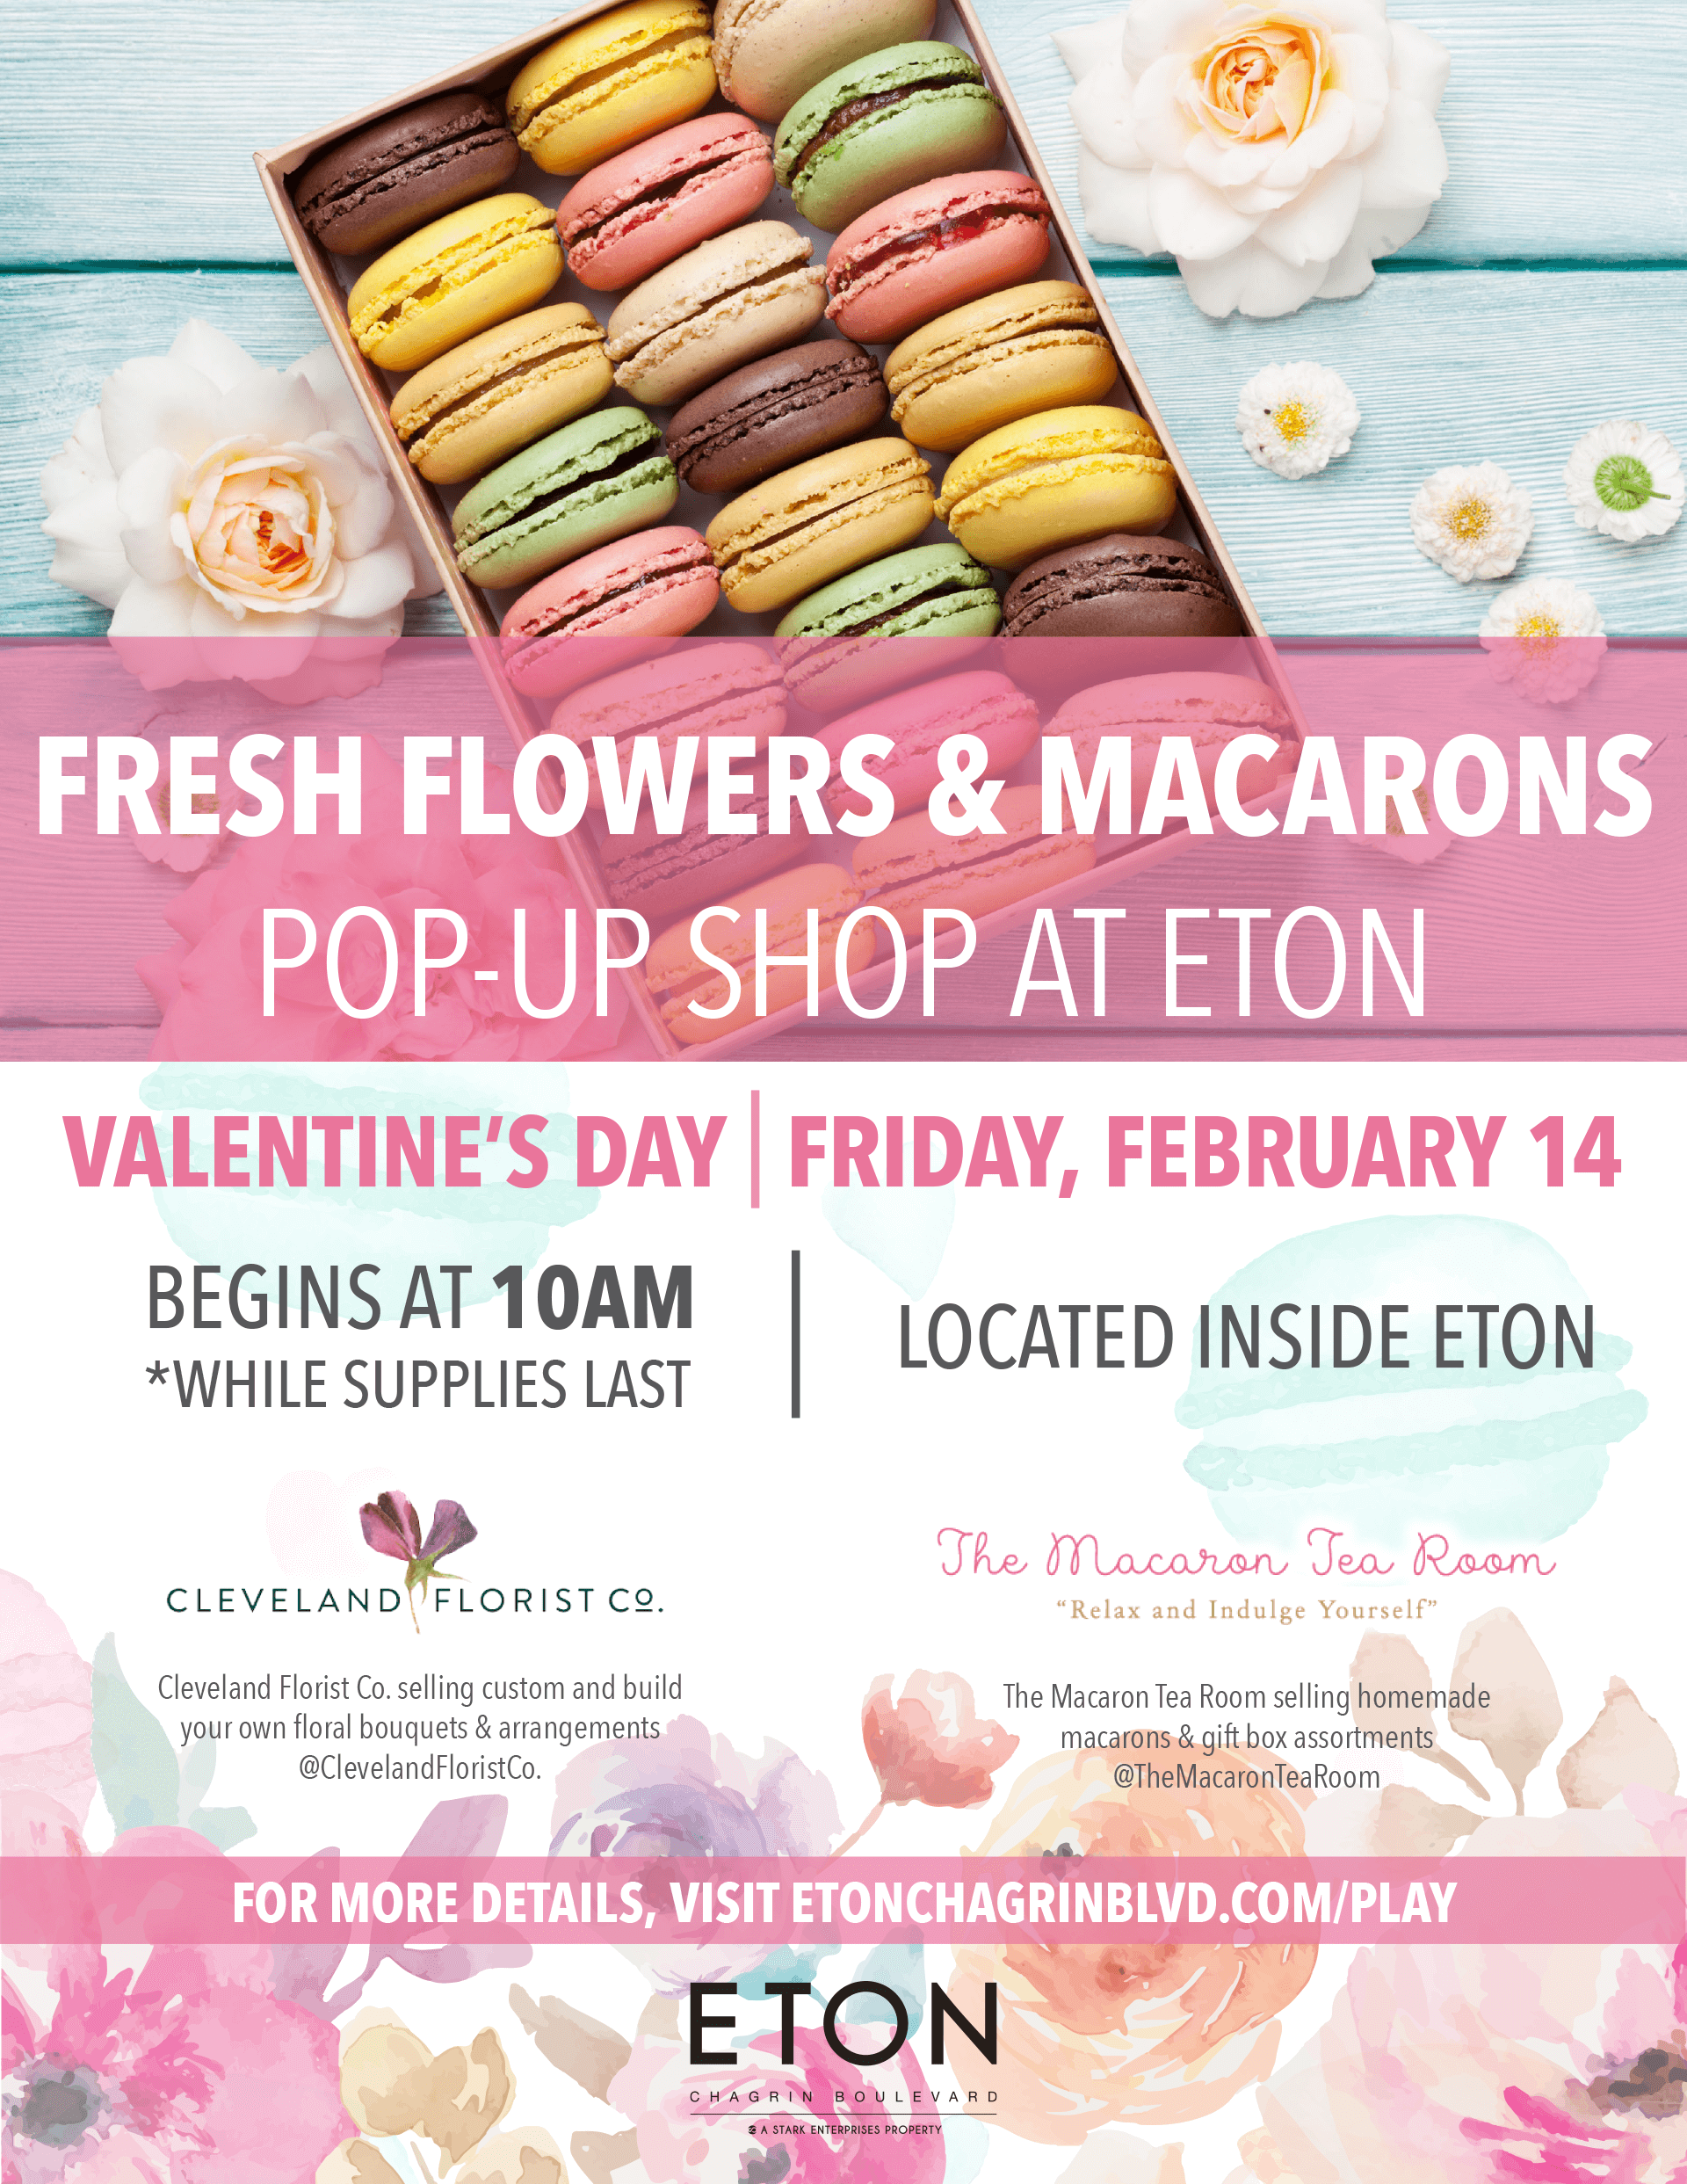 Fresh Flowers & Macarons Pop-Up